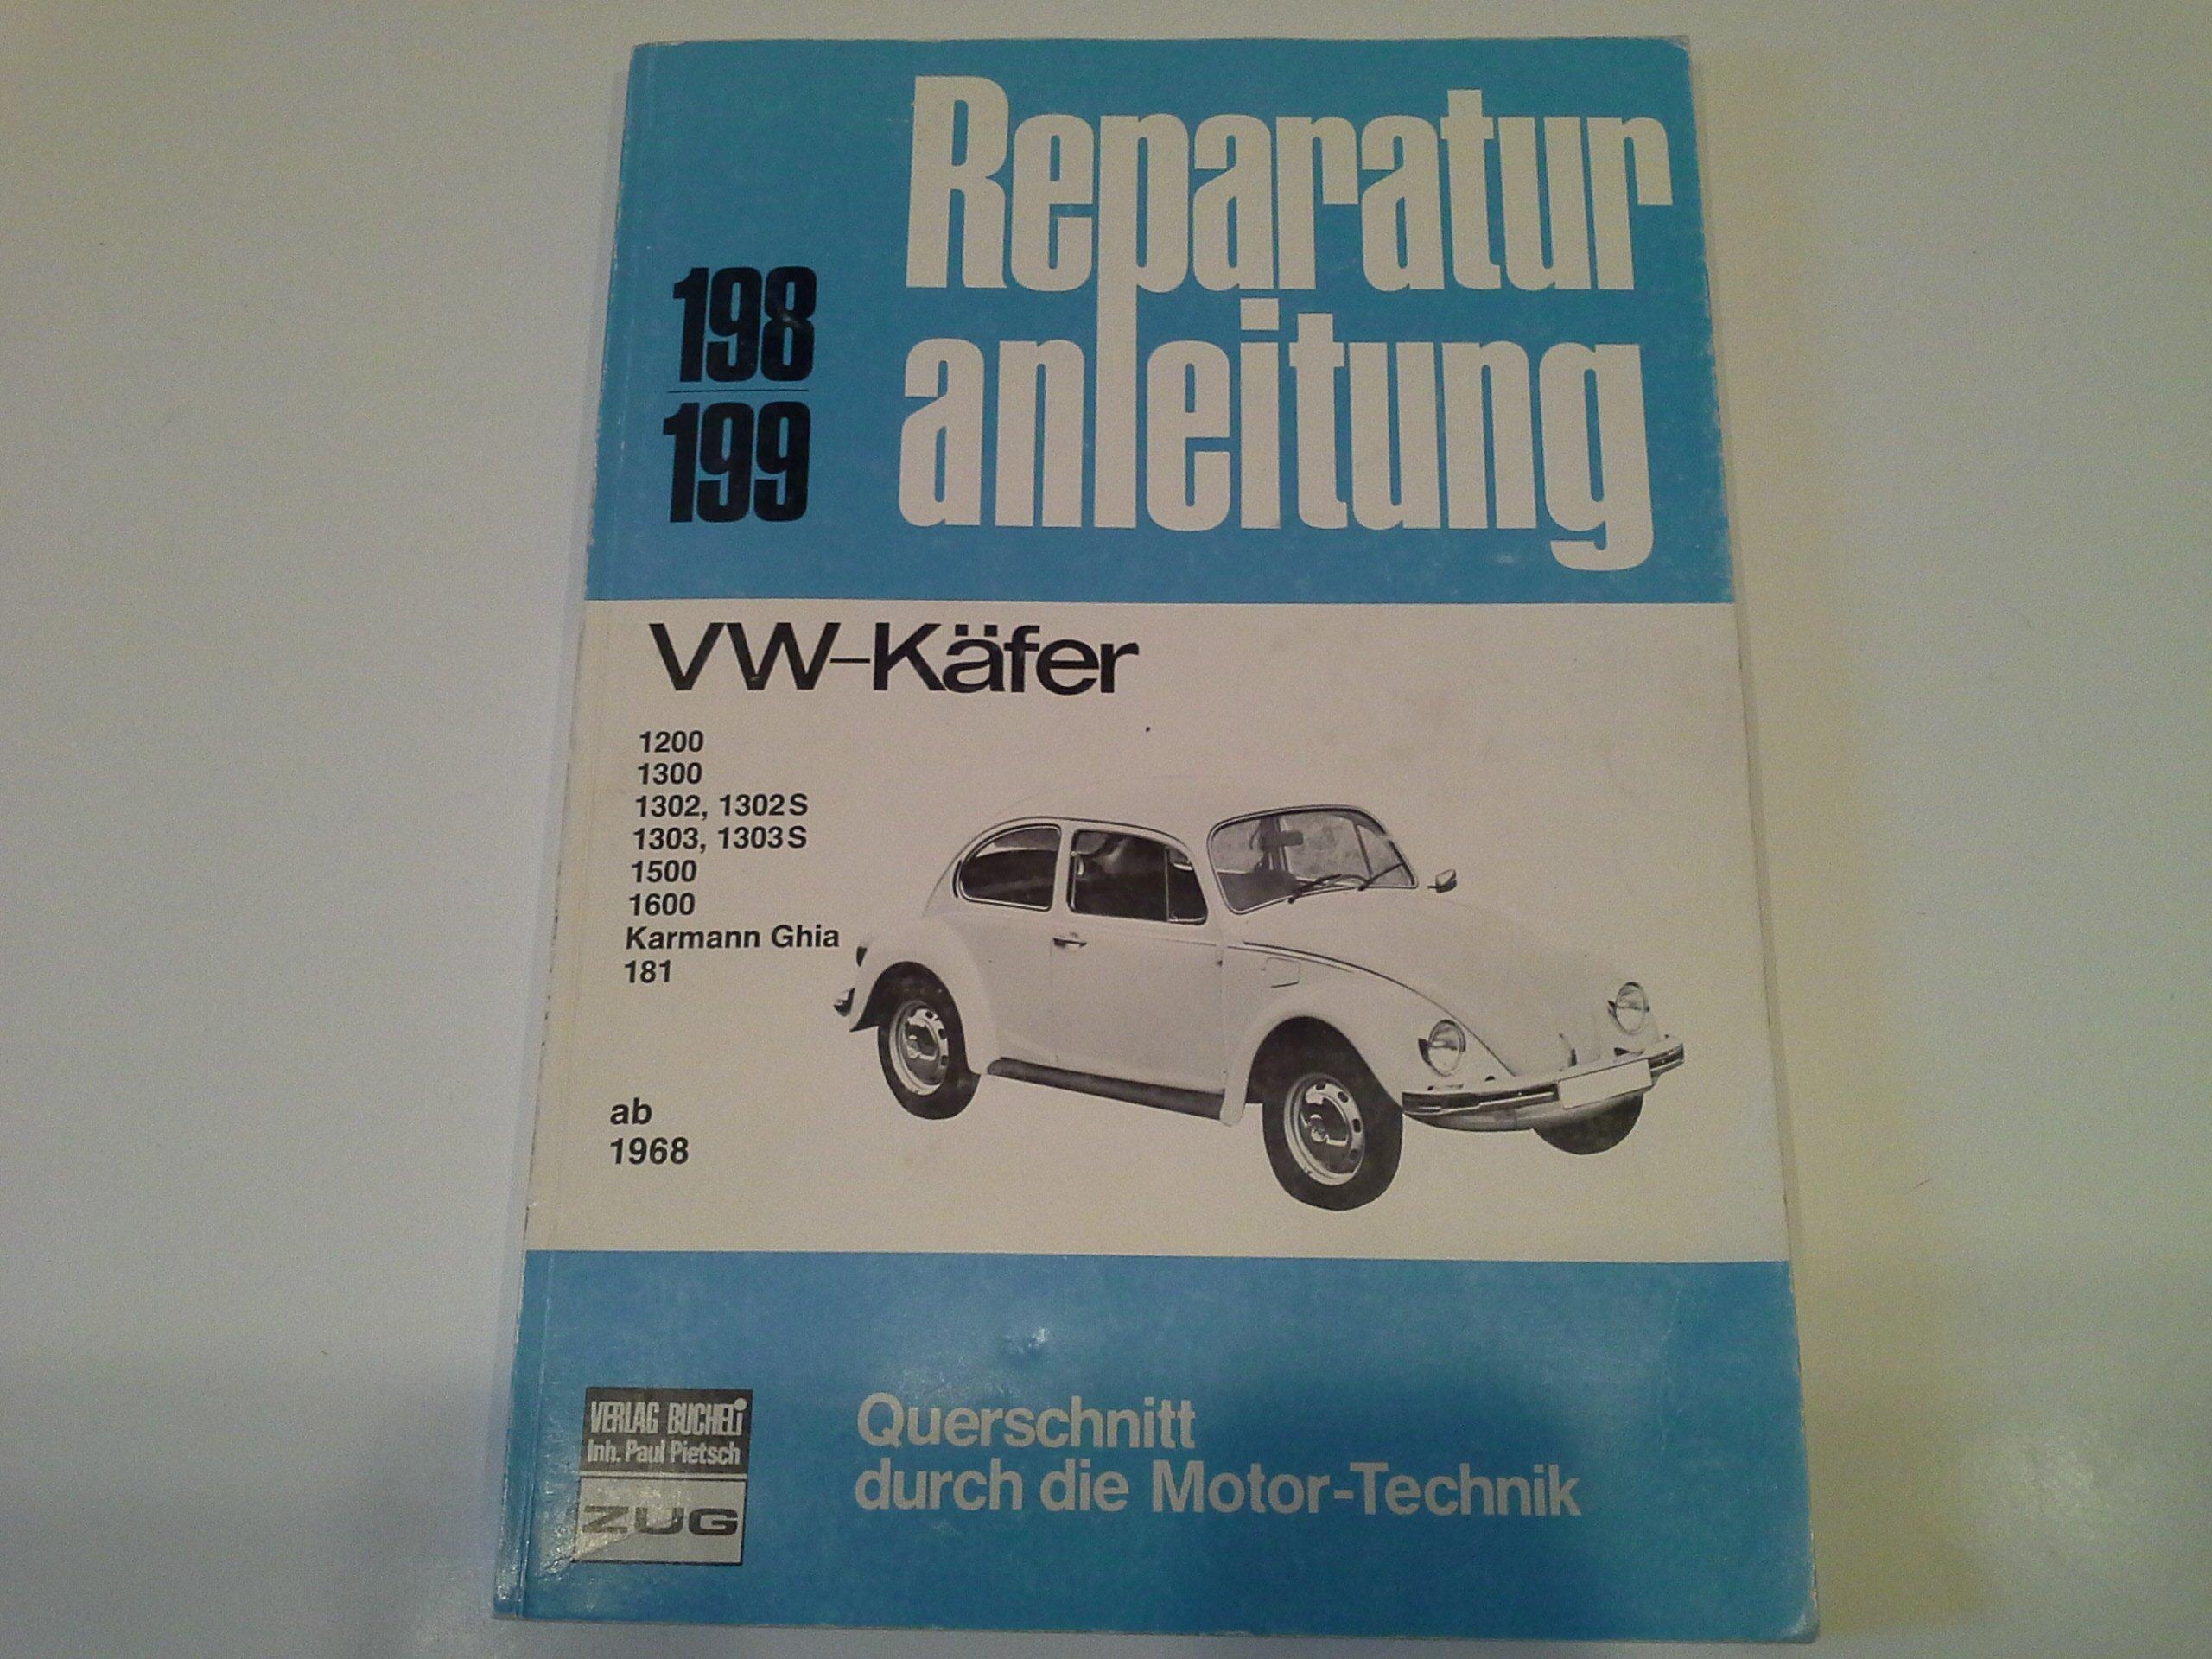 Reparaturanleitung Vw Käfer Ab 1968 198 199 Vw Käfer 1200 1300 1302 1302s 1303 1303 S 1500 1600 Karmann Ghia 181 Ab 1968 Bucheli Bücher